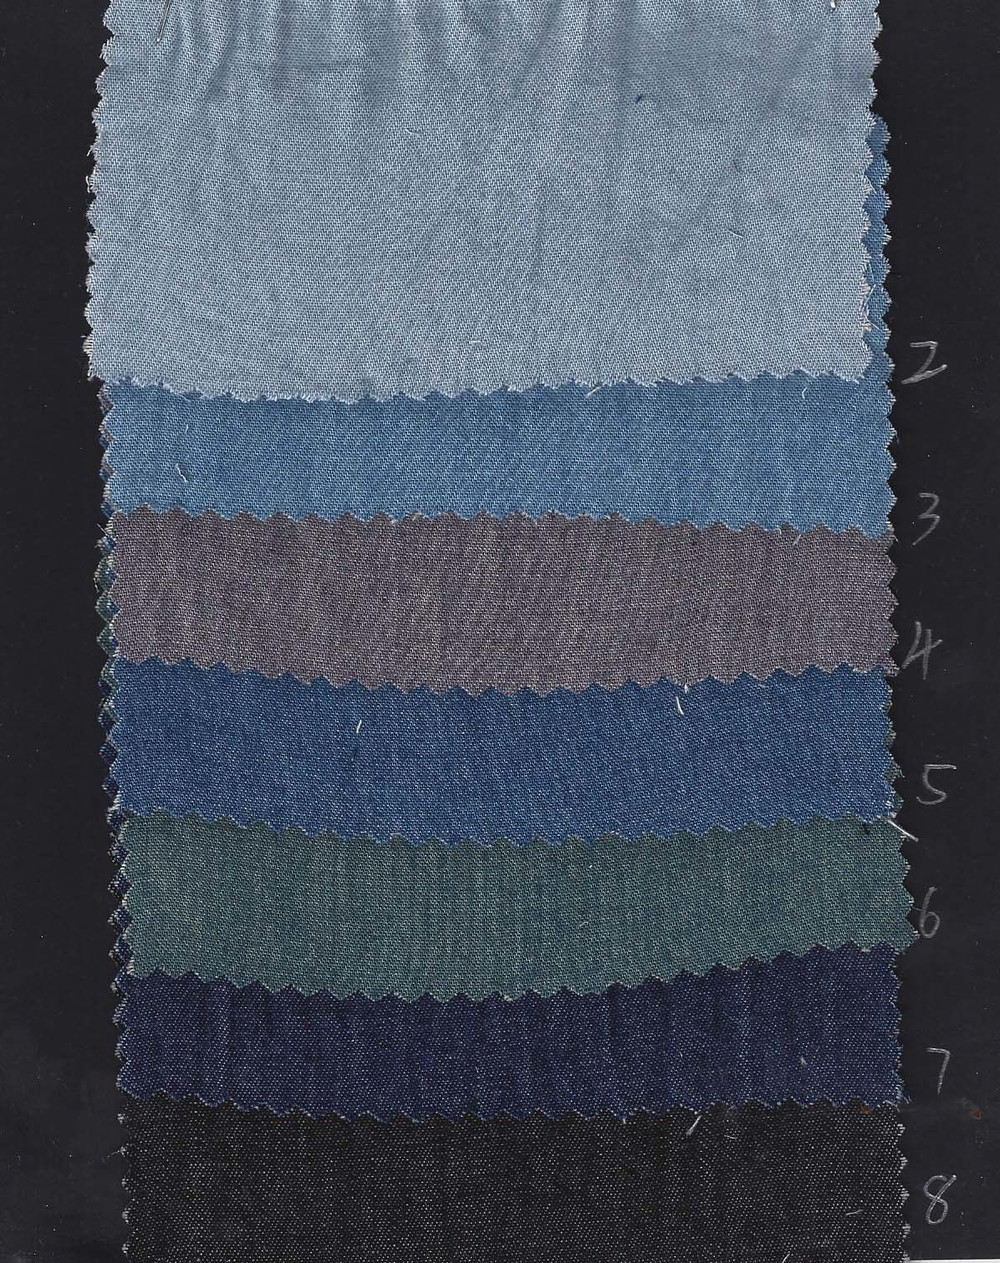 Yuan Sheng Textile K012.jpg